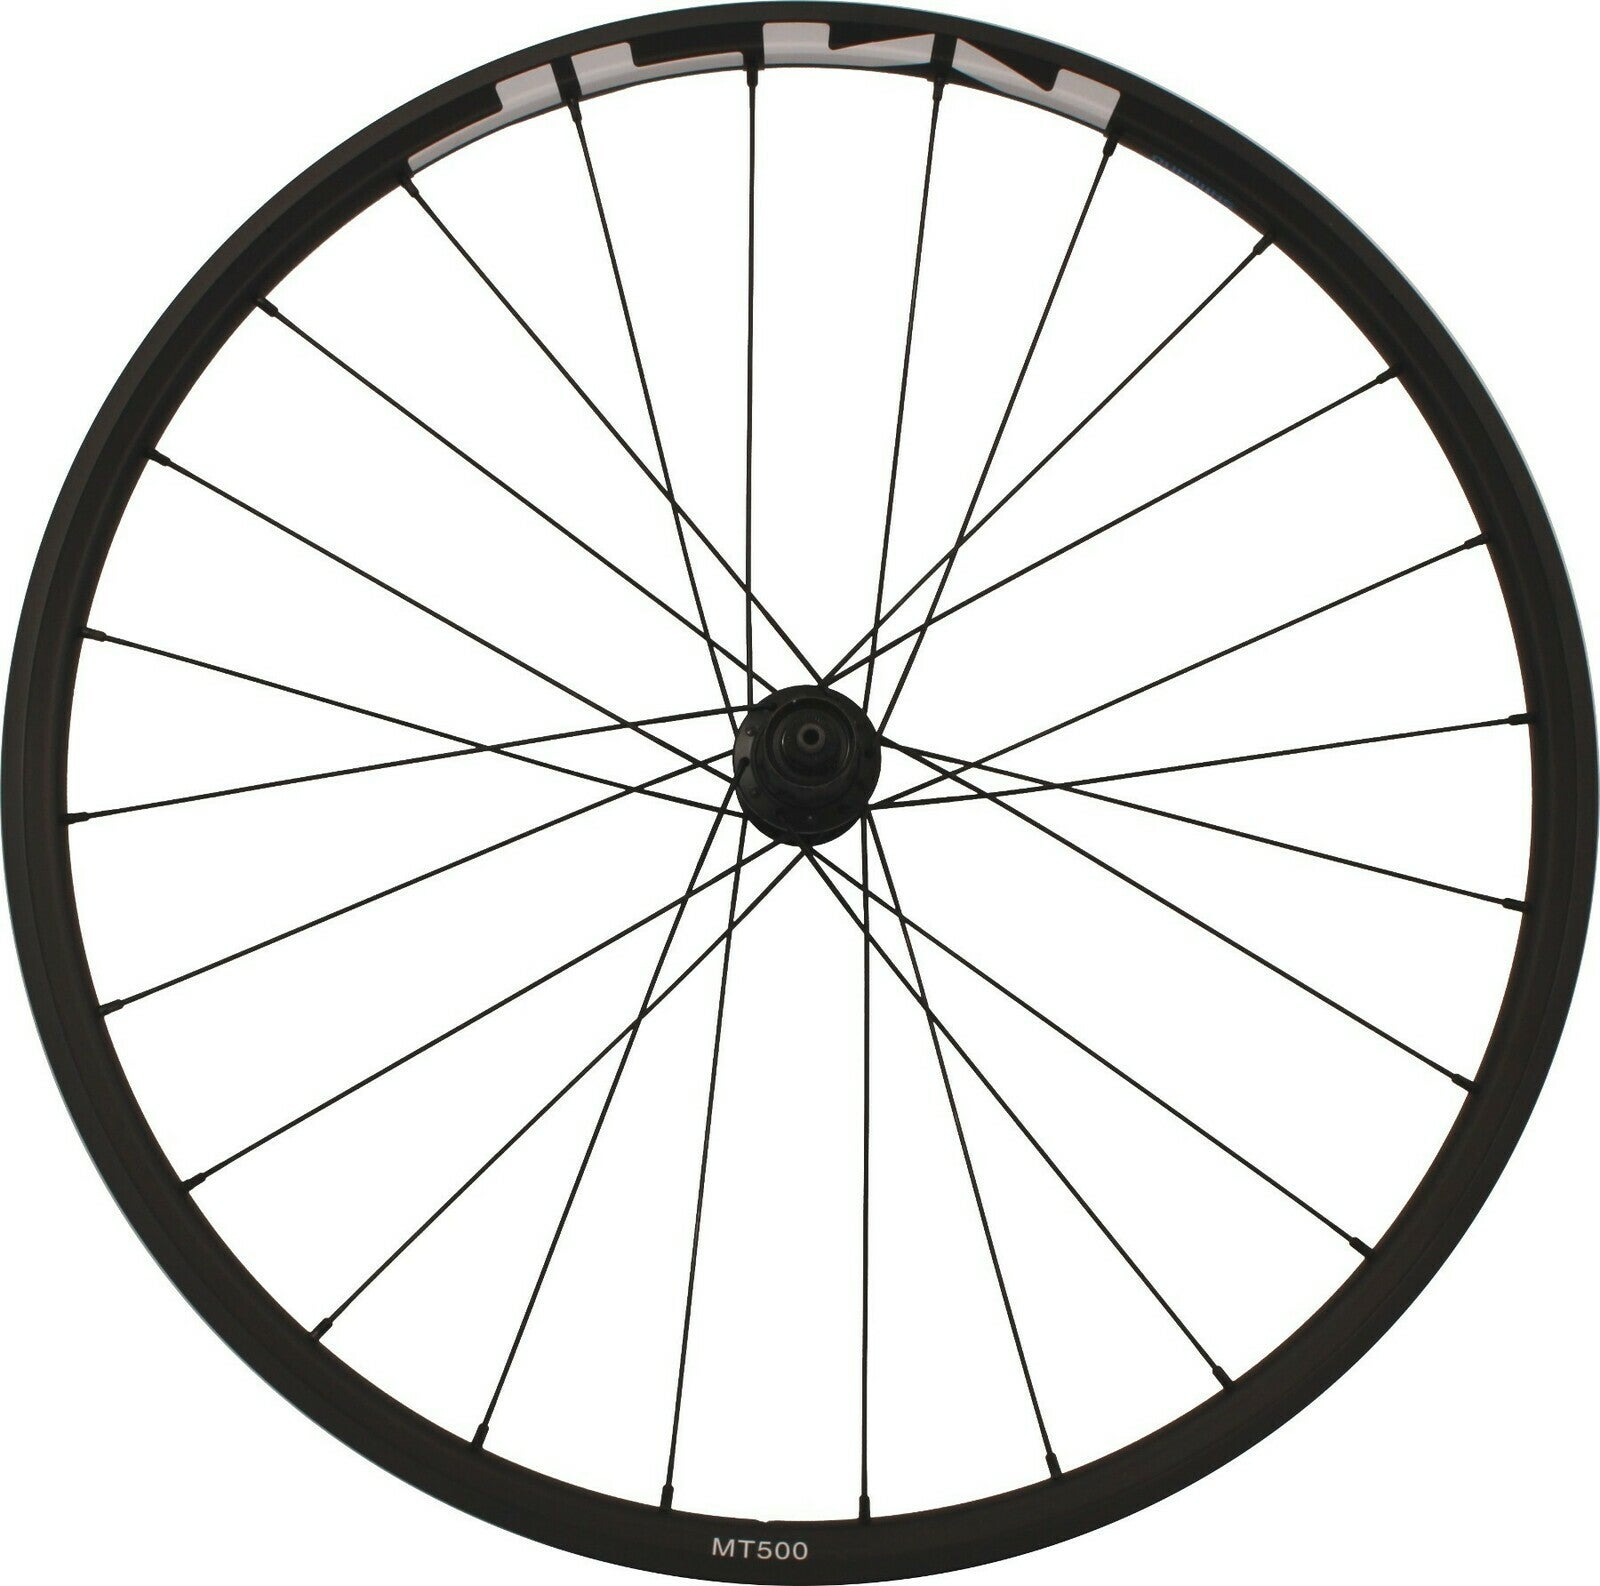 "Shimano WH-MT500 27.5"" (650B) Centrelock MTB Front Wheel Black"